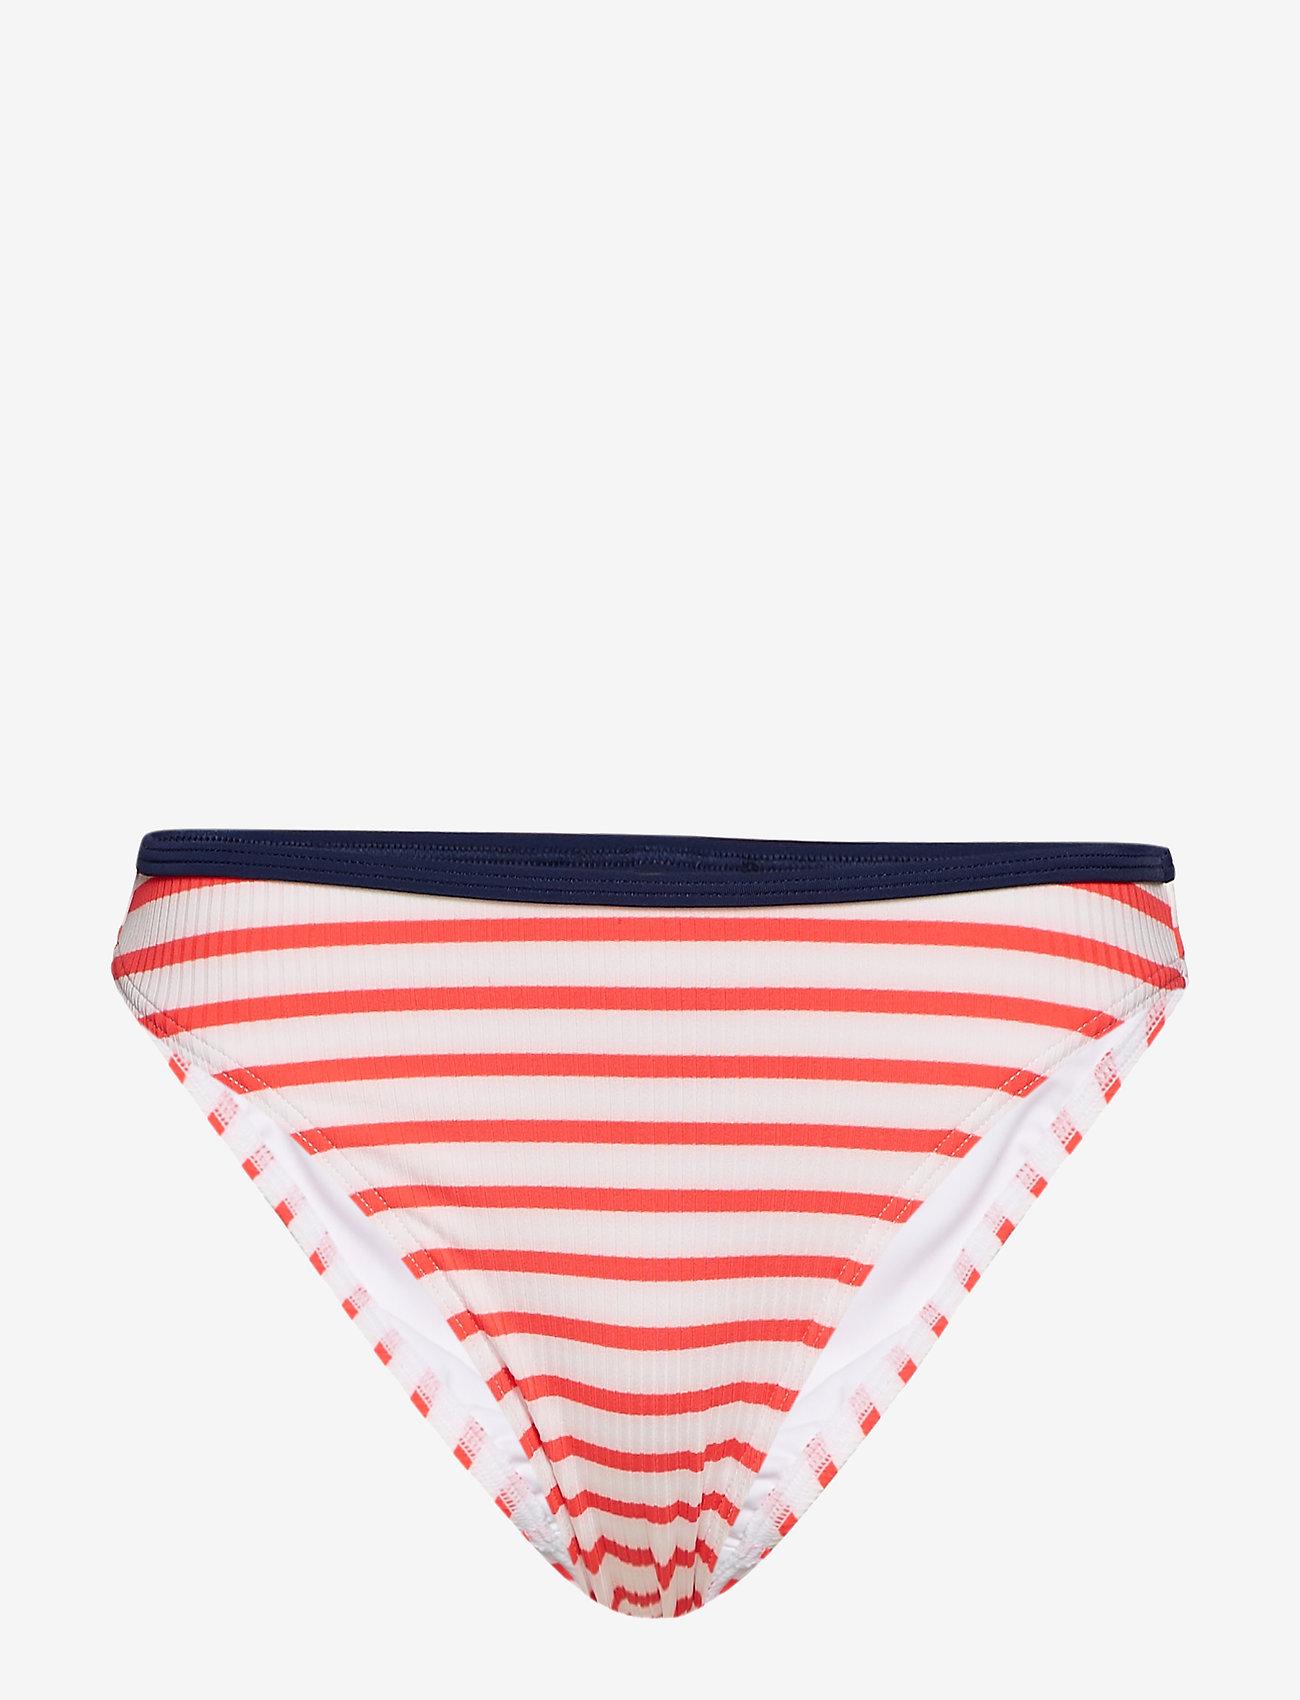 Esprit Bodywear Women - Beach Bottoms - bikiniunderdeler - pink fuchsia - 0